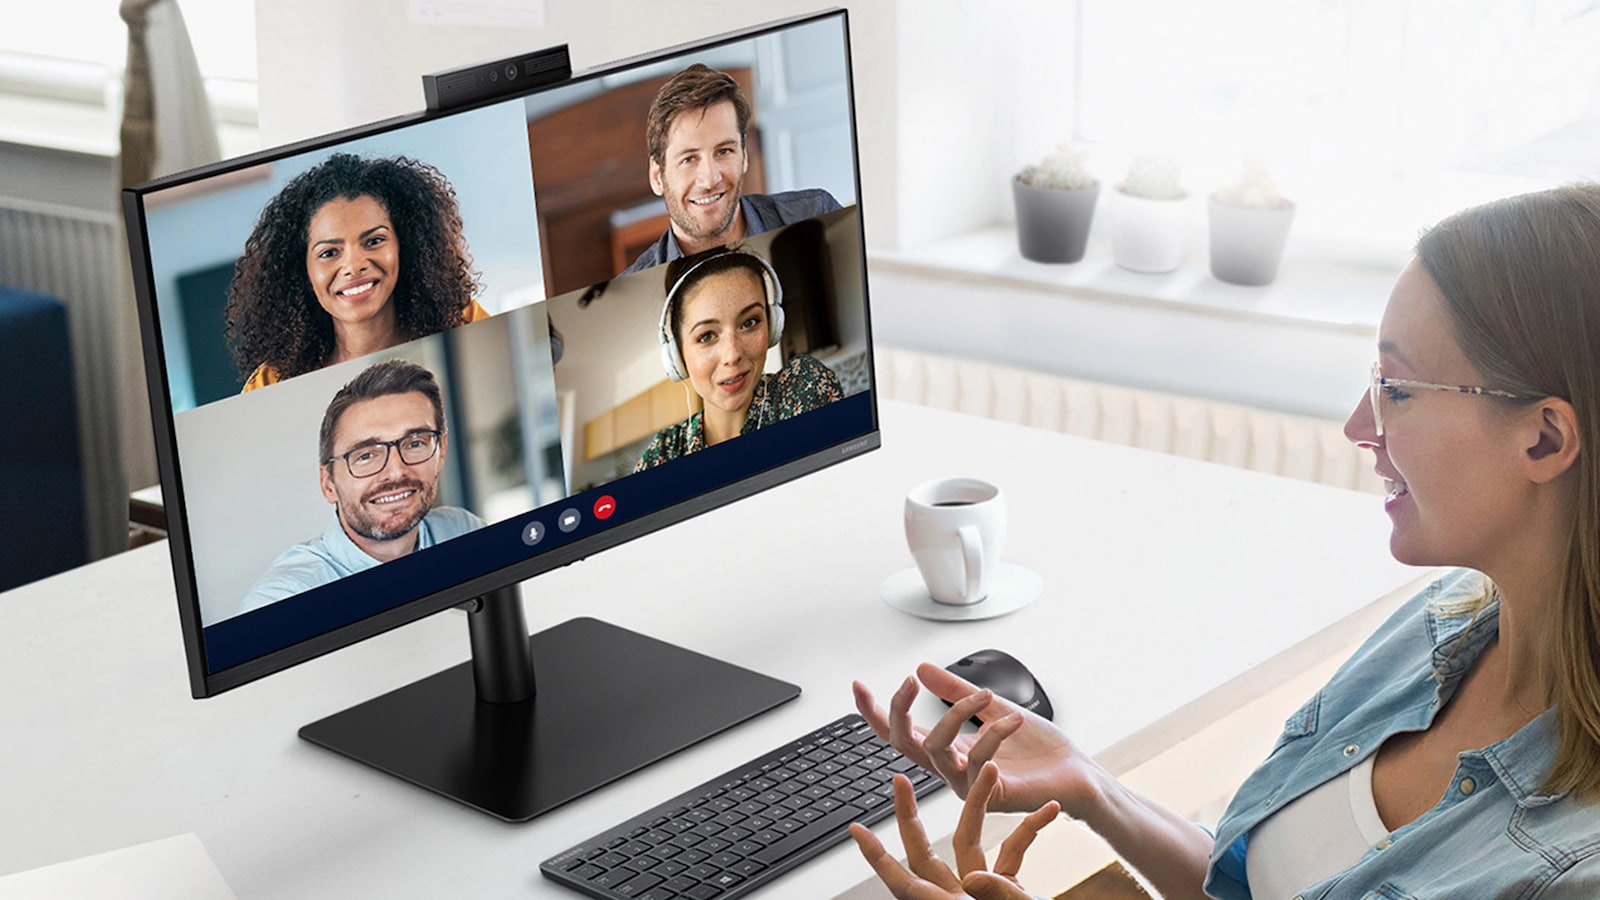 Samsung-Webcam-Monitor-S4-01.jpg